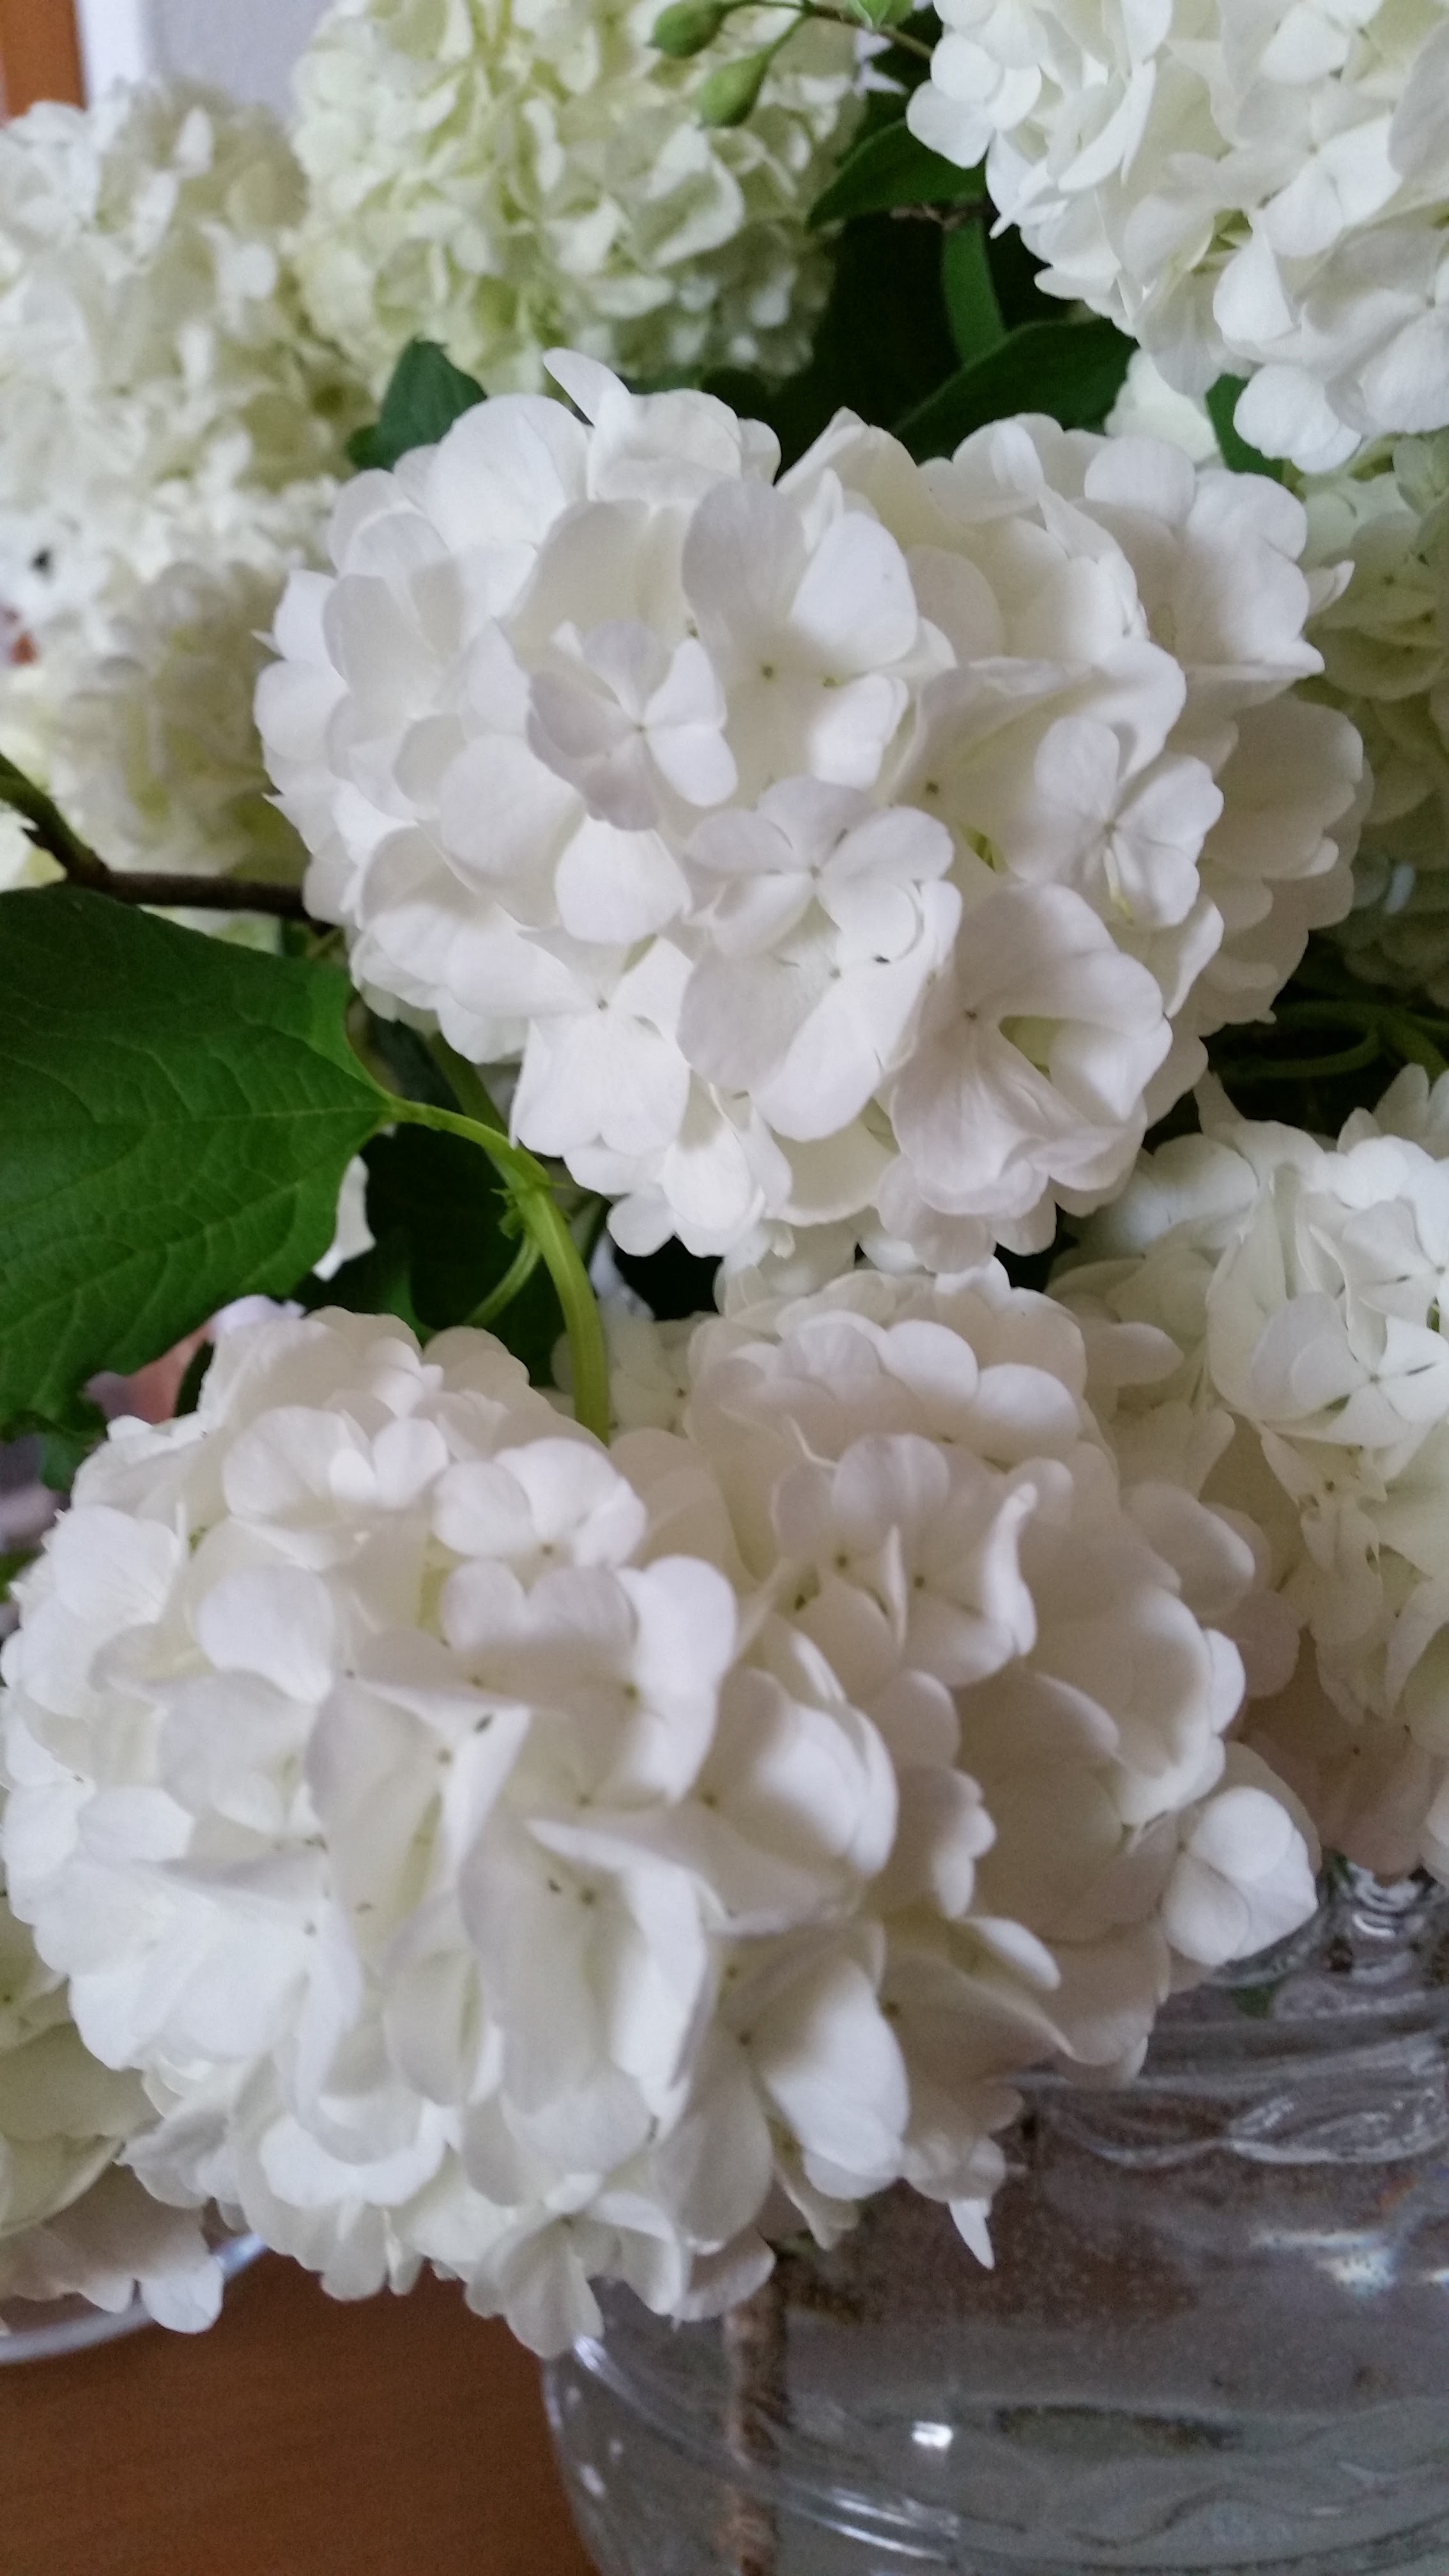 fiori bianchi per laura biagiotti